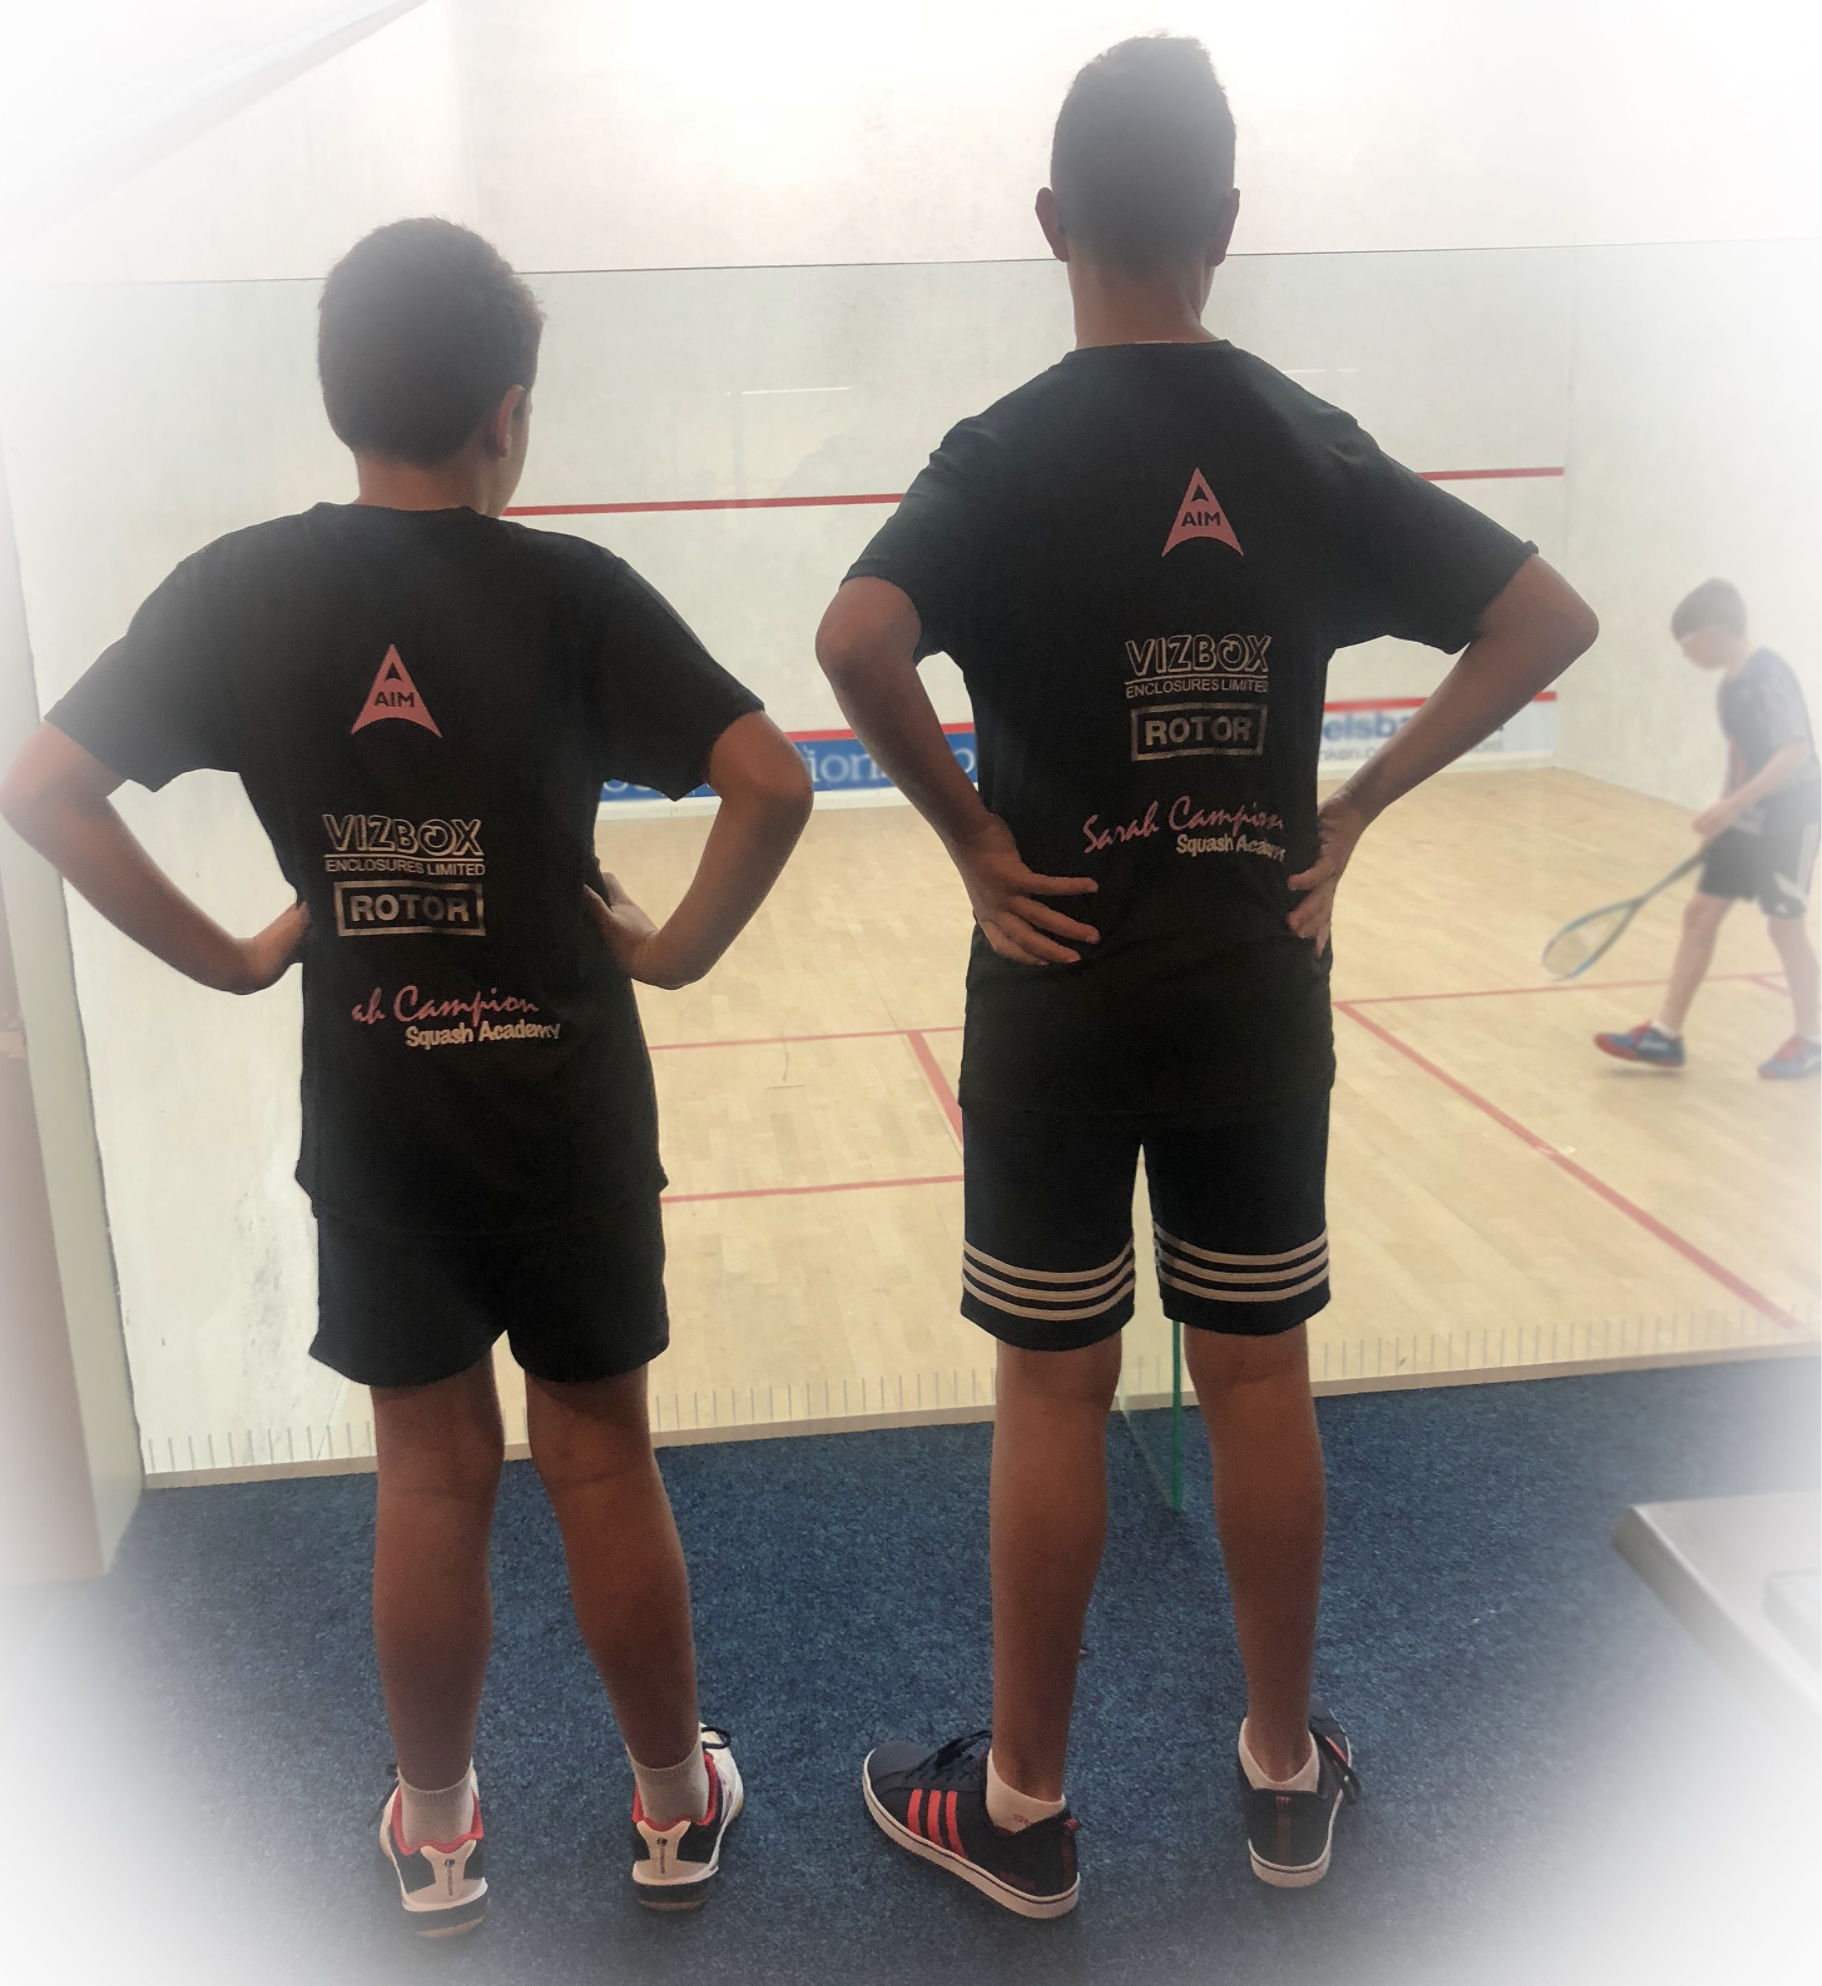 Sarah Campion Junior Squash Academy